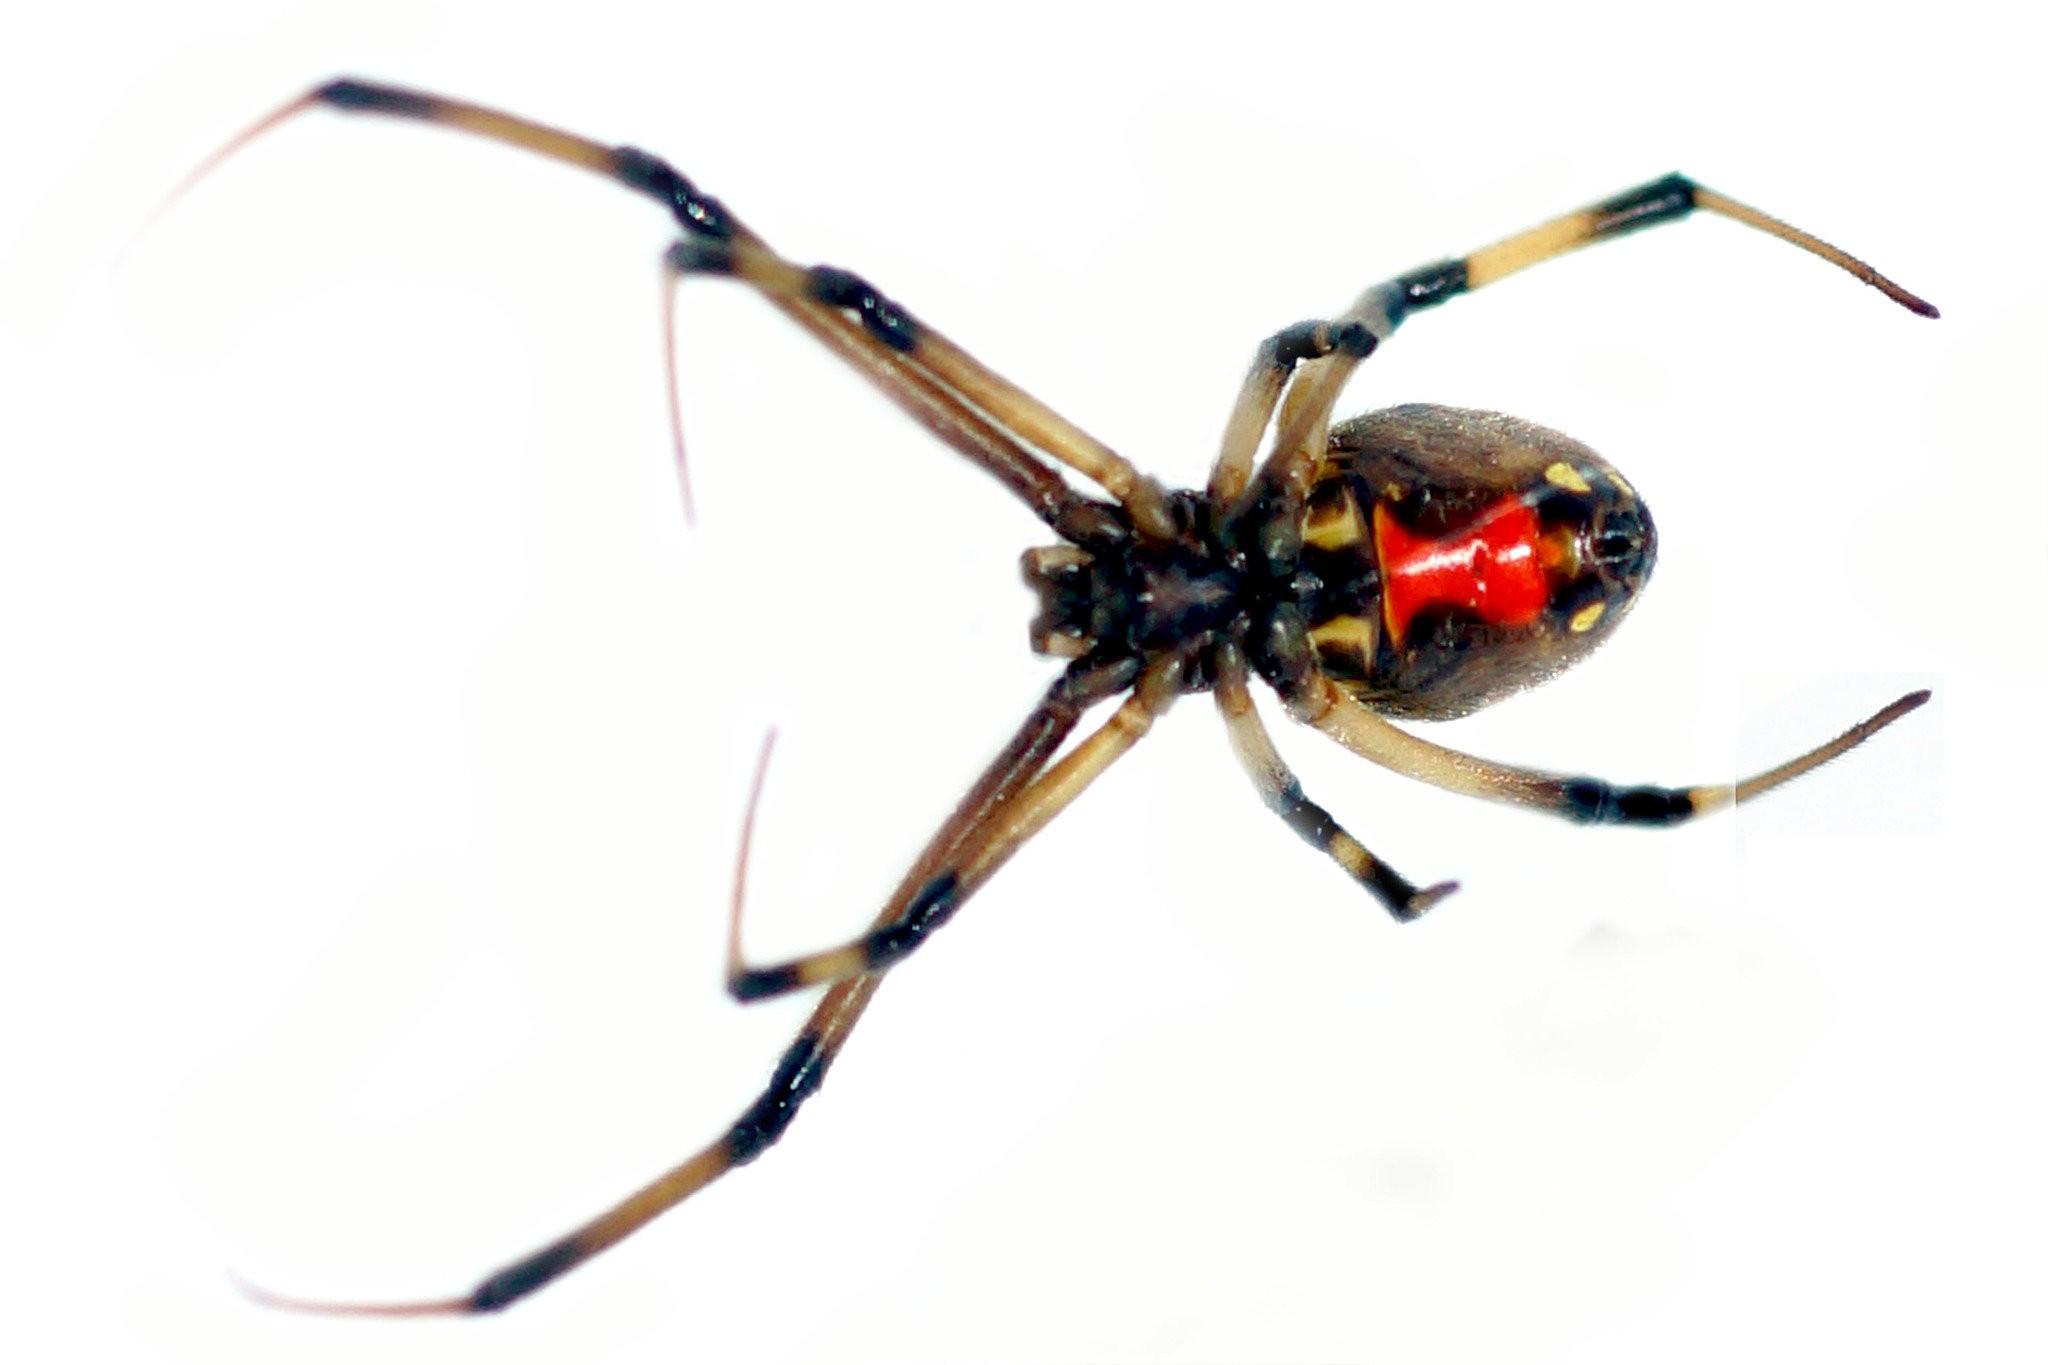 Beware New Venomous Spider Spotted In Oregon Oregonlive Com